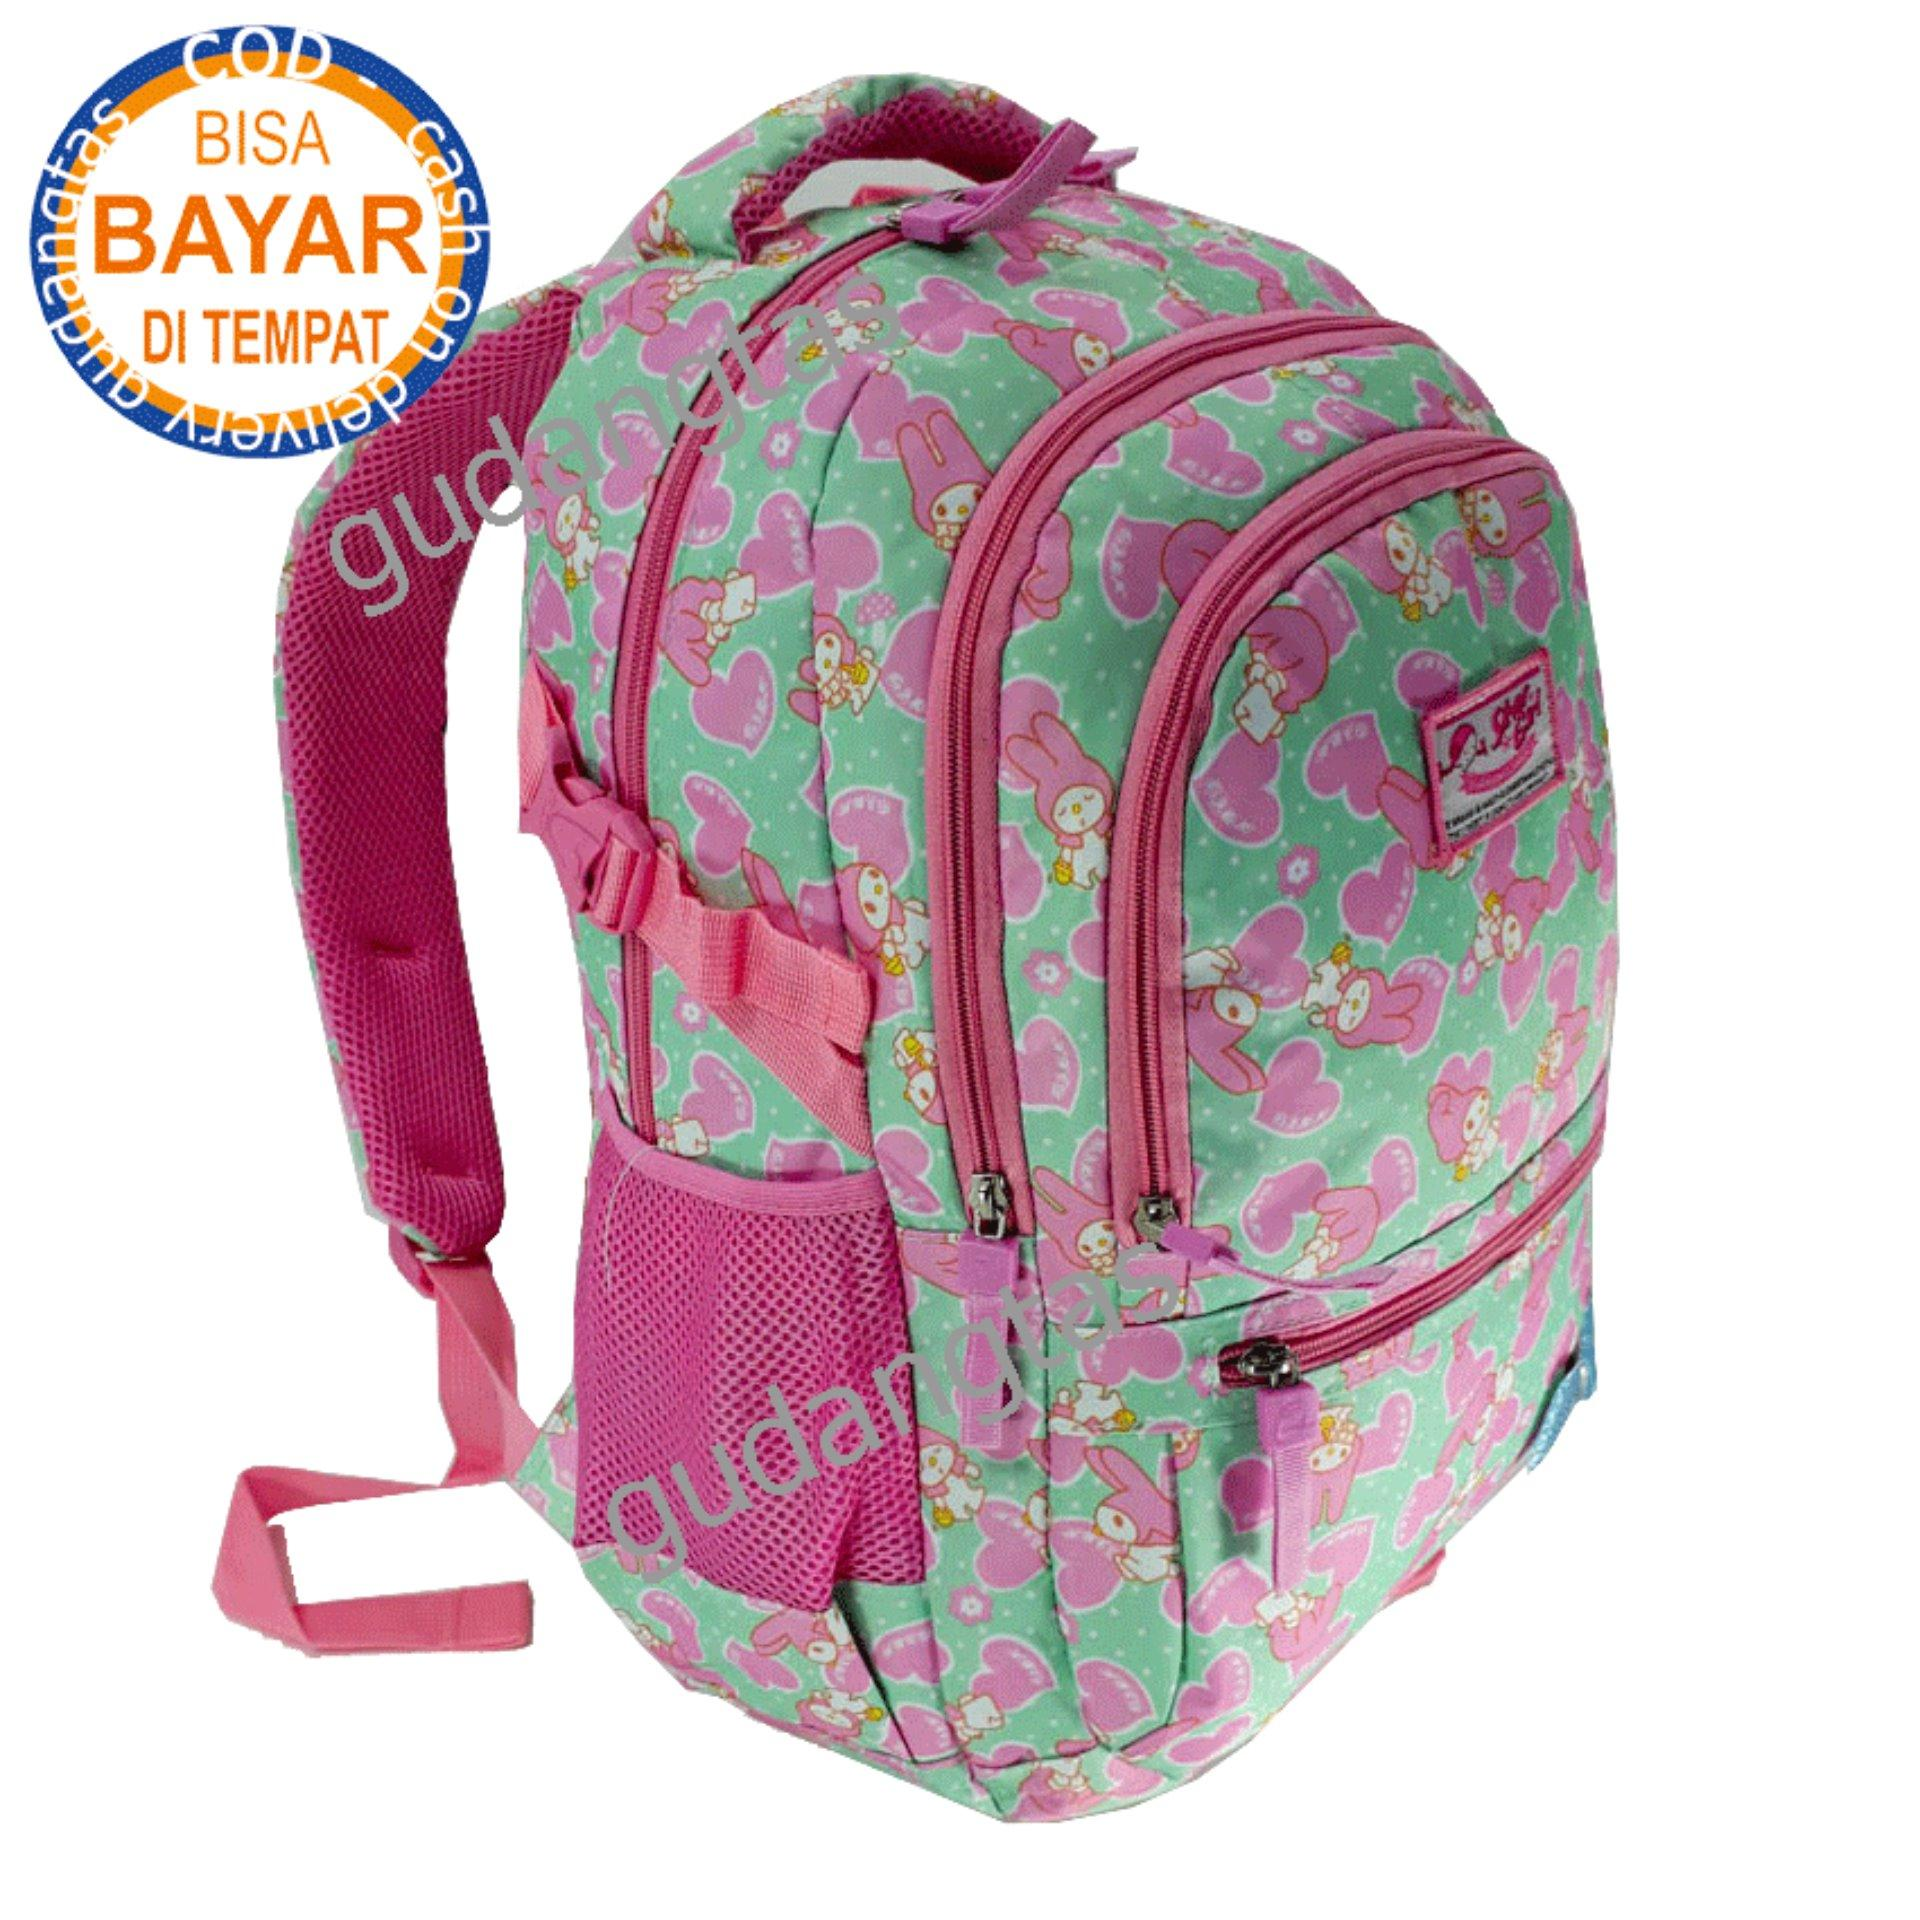 Alto Backpack Super Tas Sekolah Tas Kuliah Tas 73677V Ransel Laptop  HIJAU + Raincover